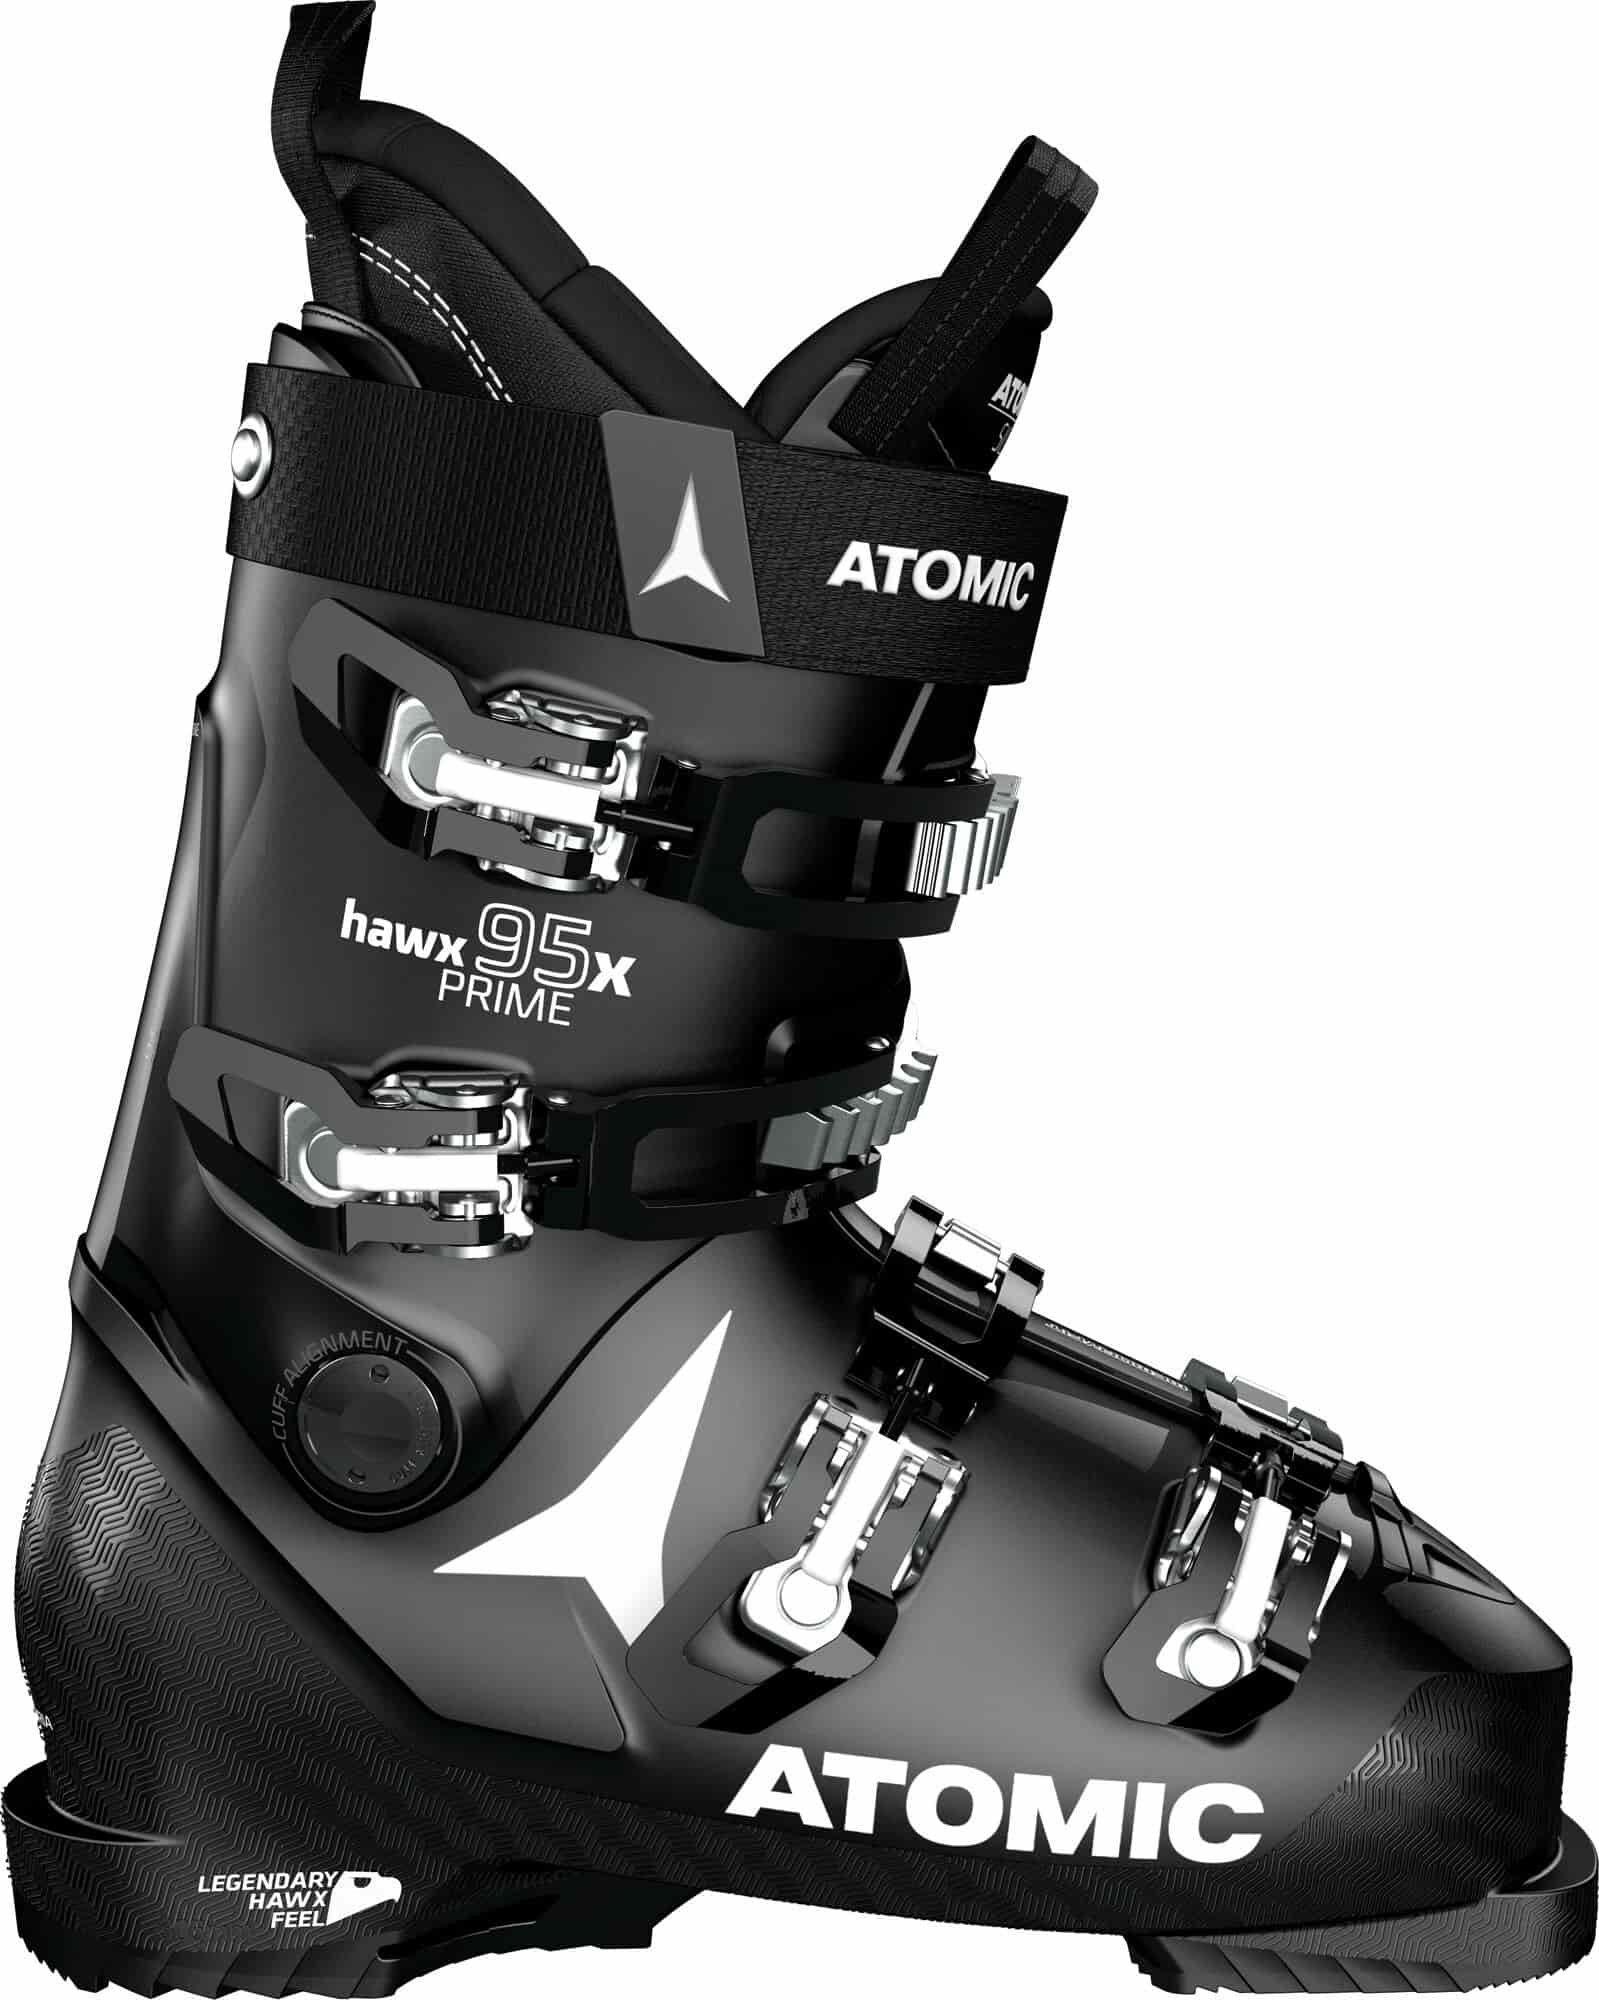 Atomic Hawx Prime 95X W 24 cm